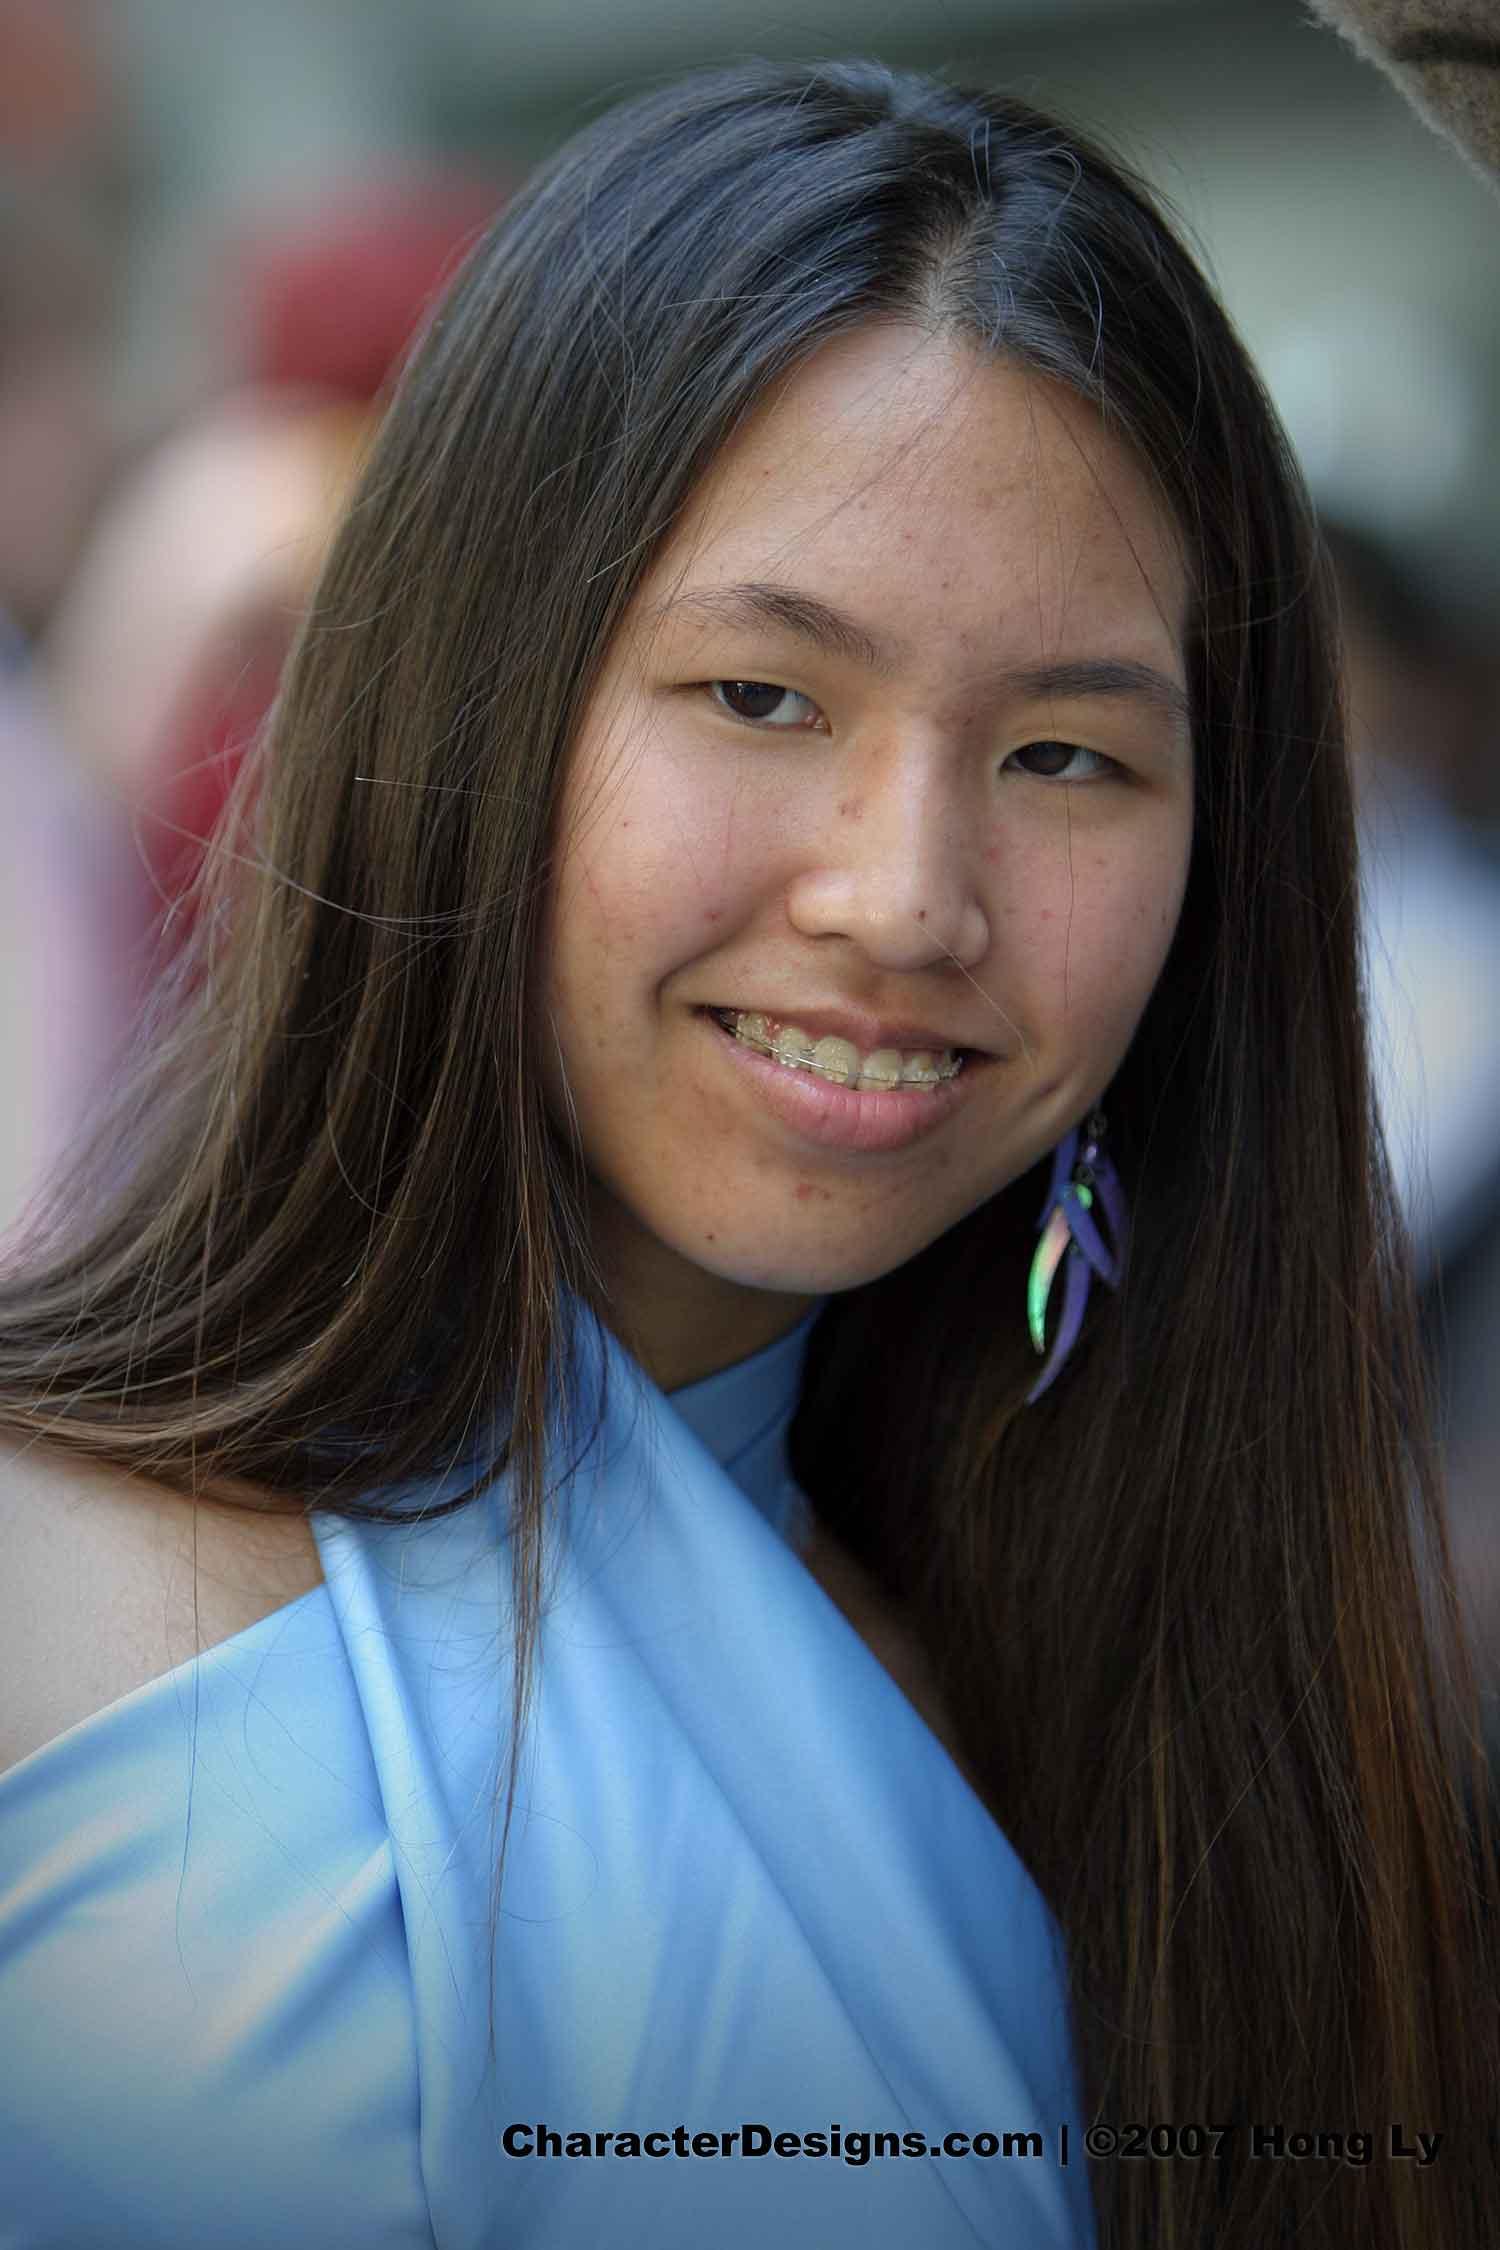 Faces_of_AX_2006_160.jpg